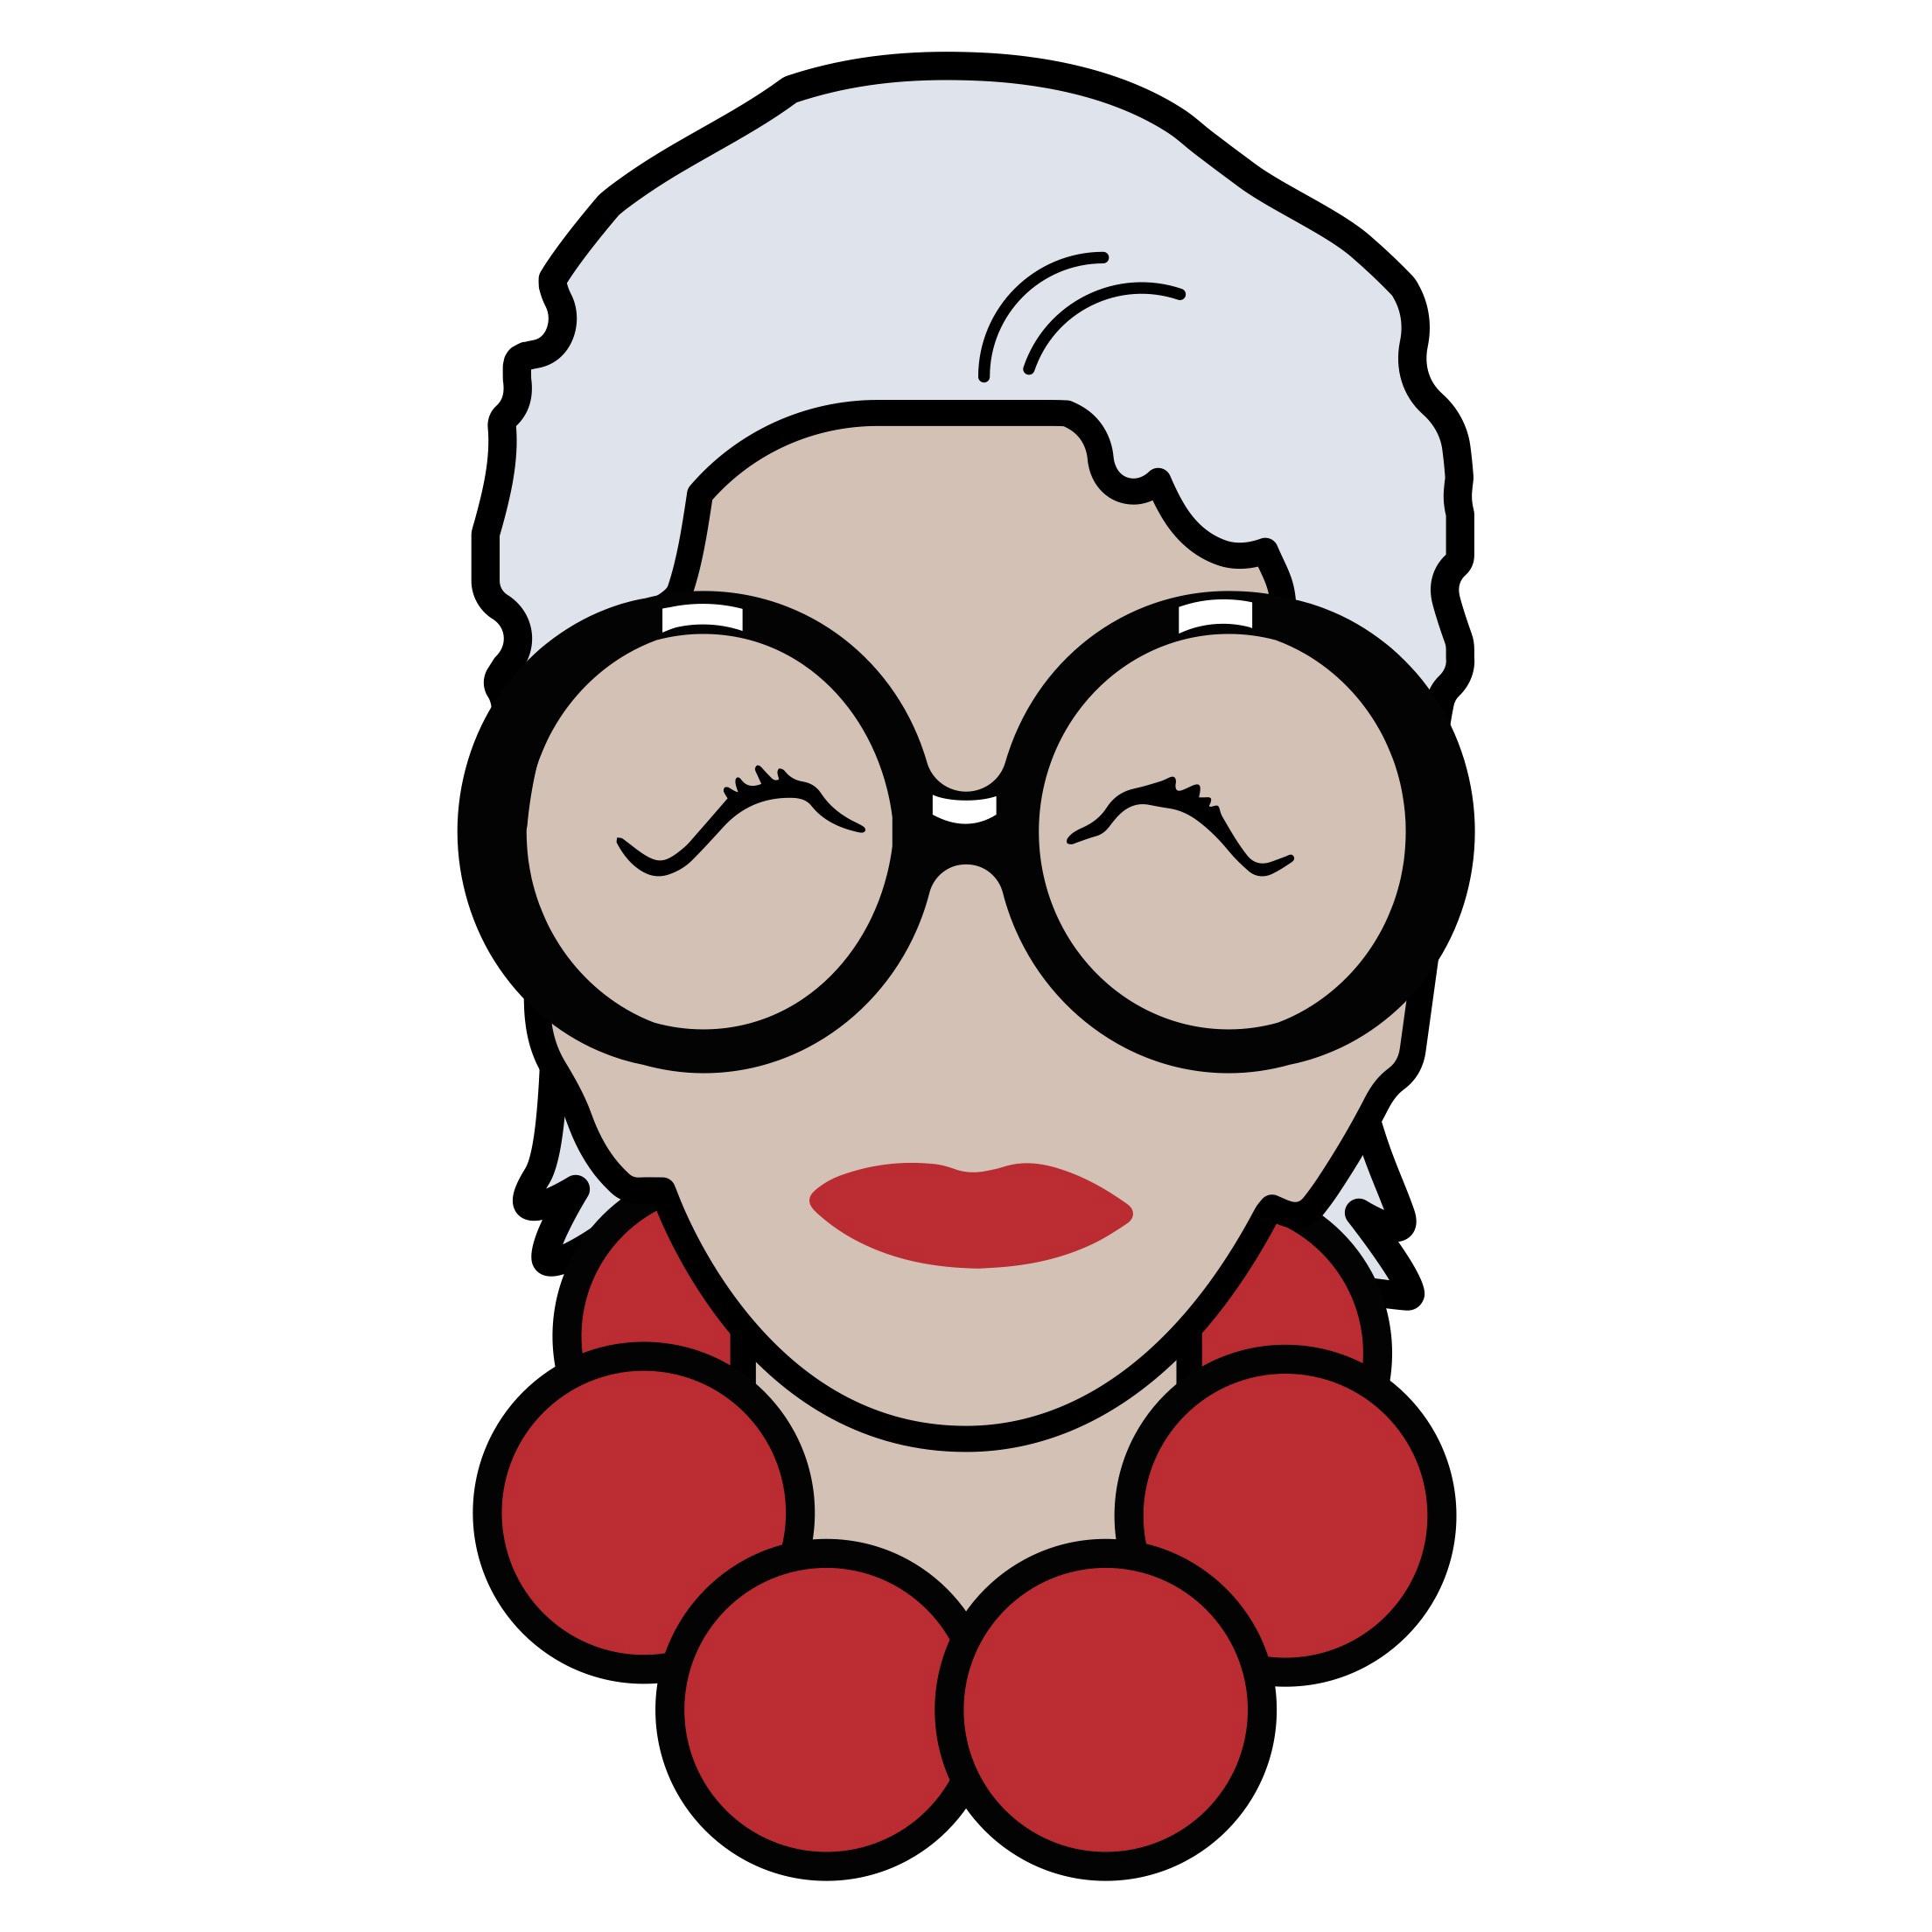 IrisMeetsINC_Emoji1